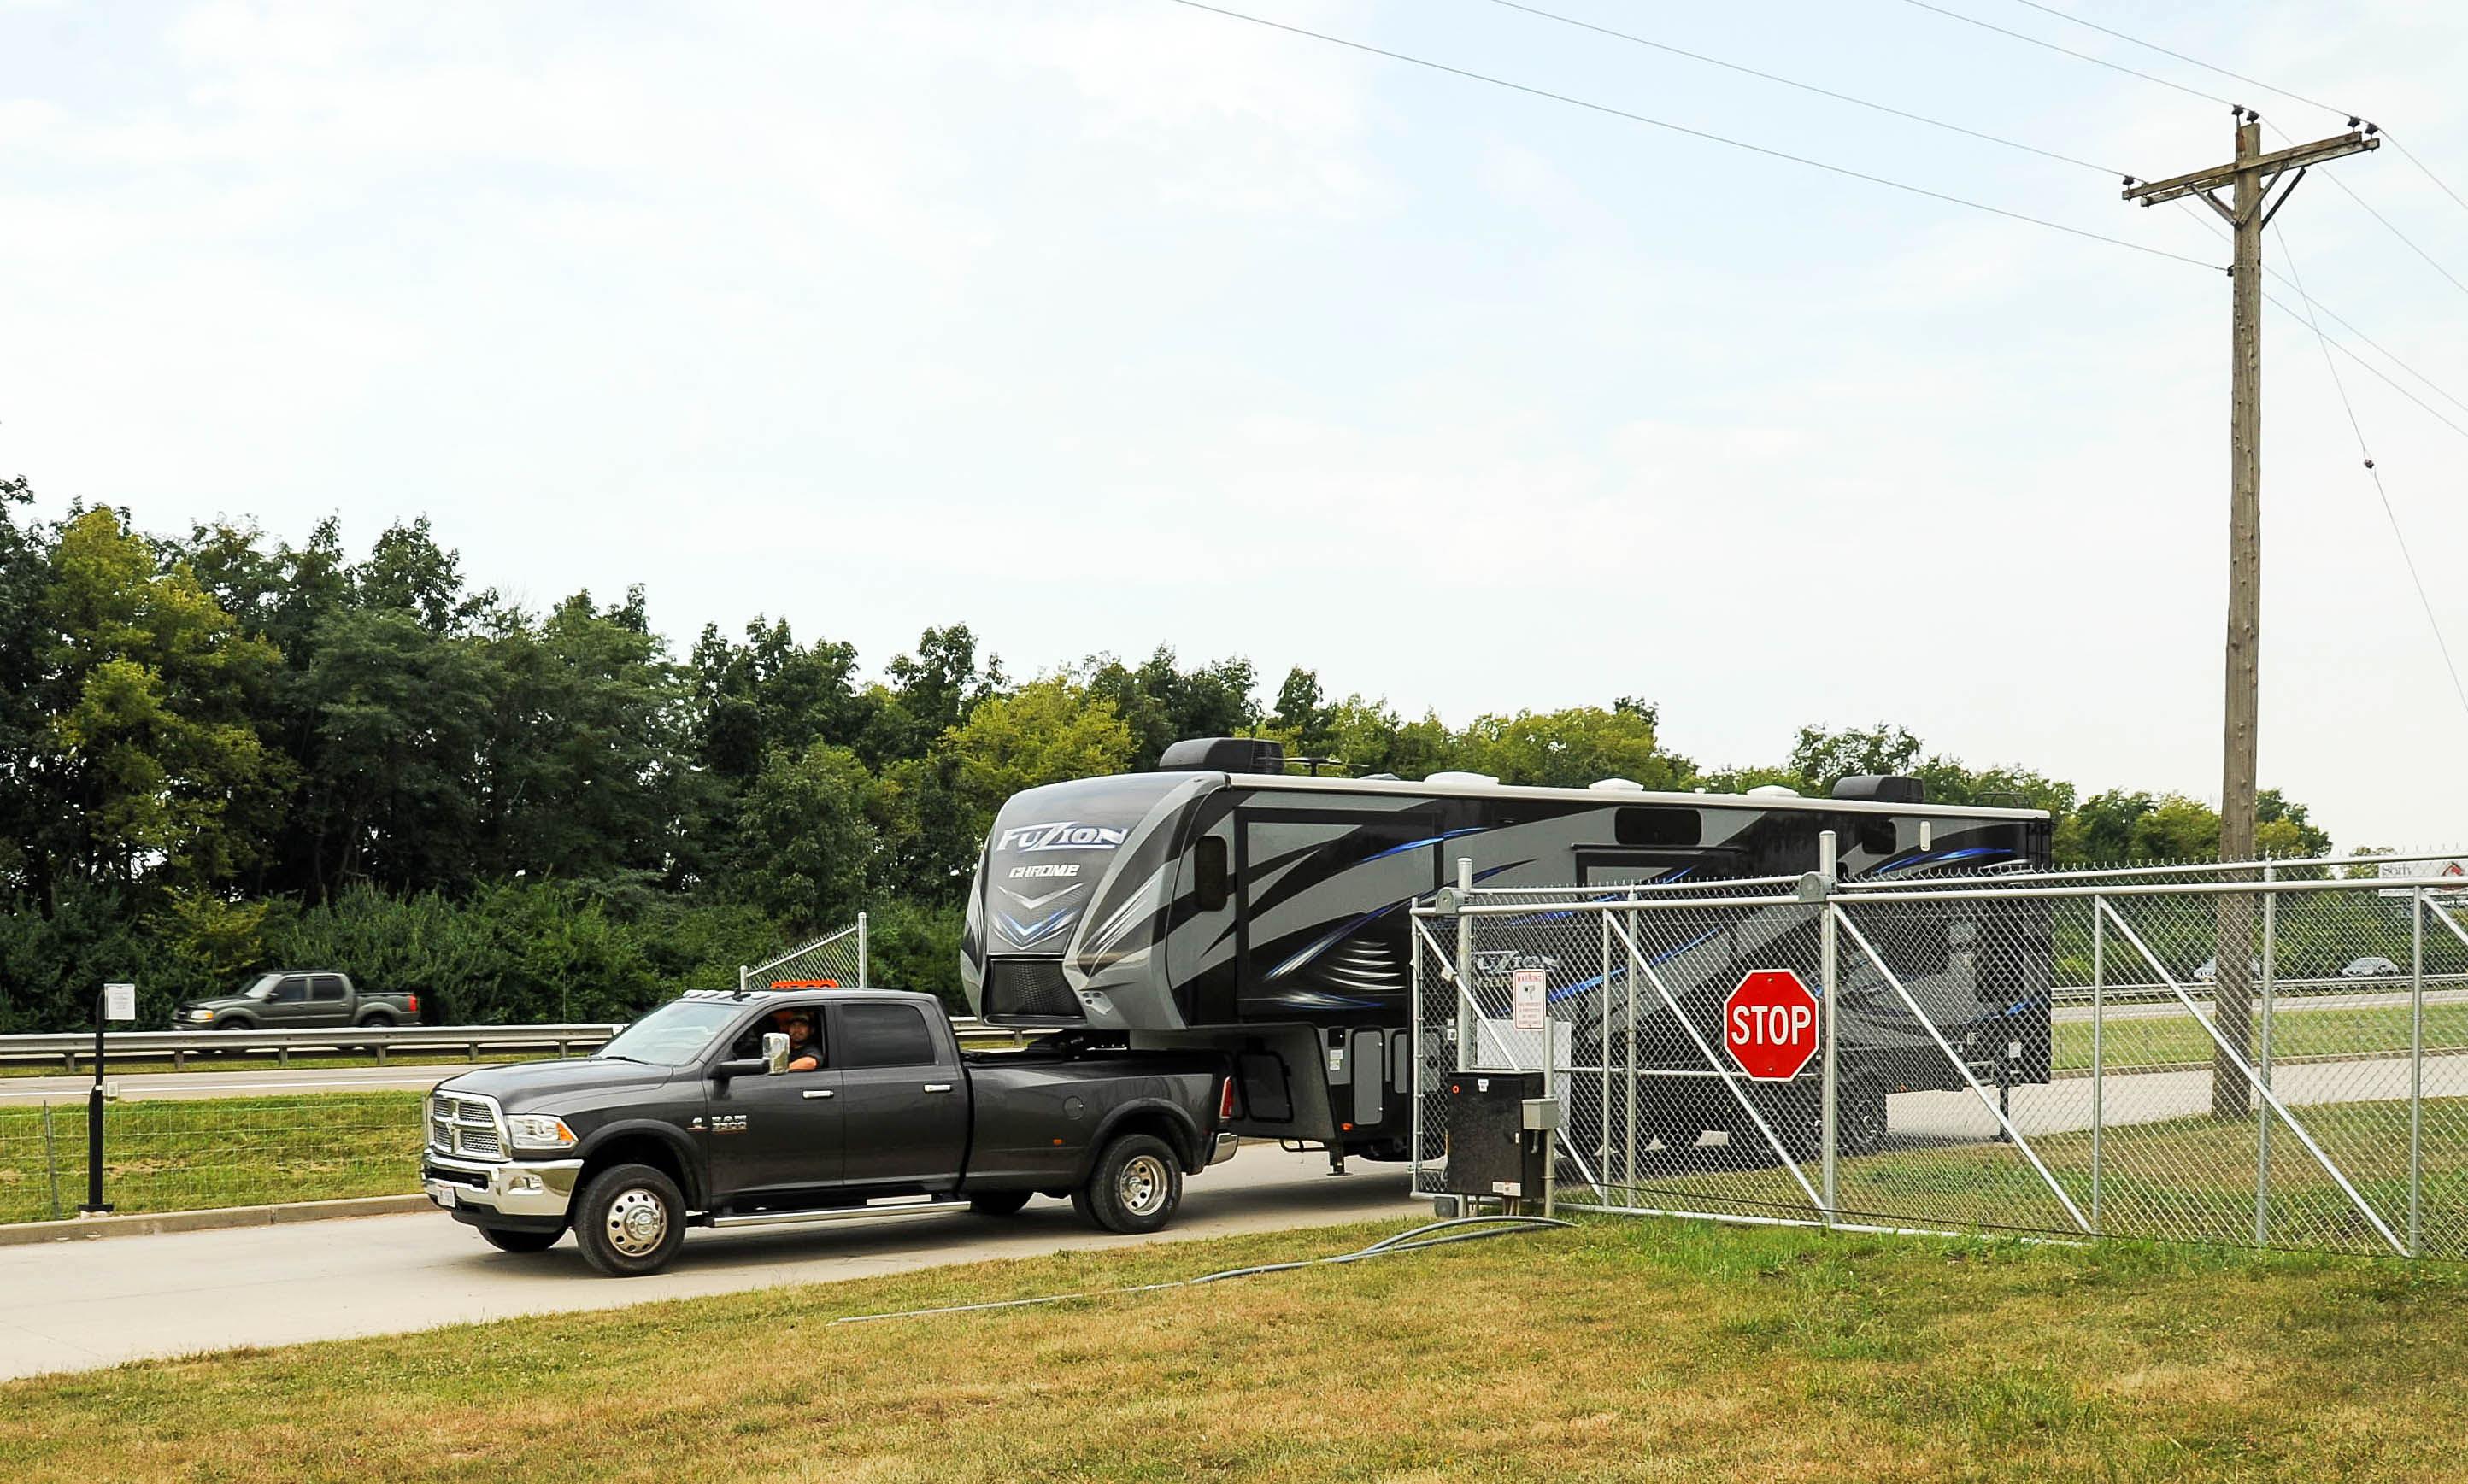 RV and boat storage in beavercreek, oh